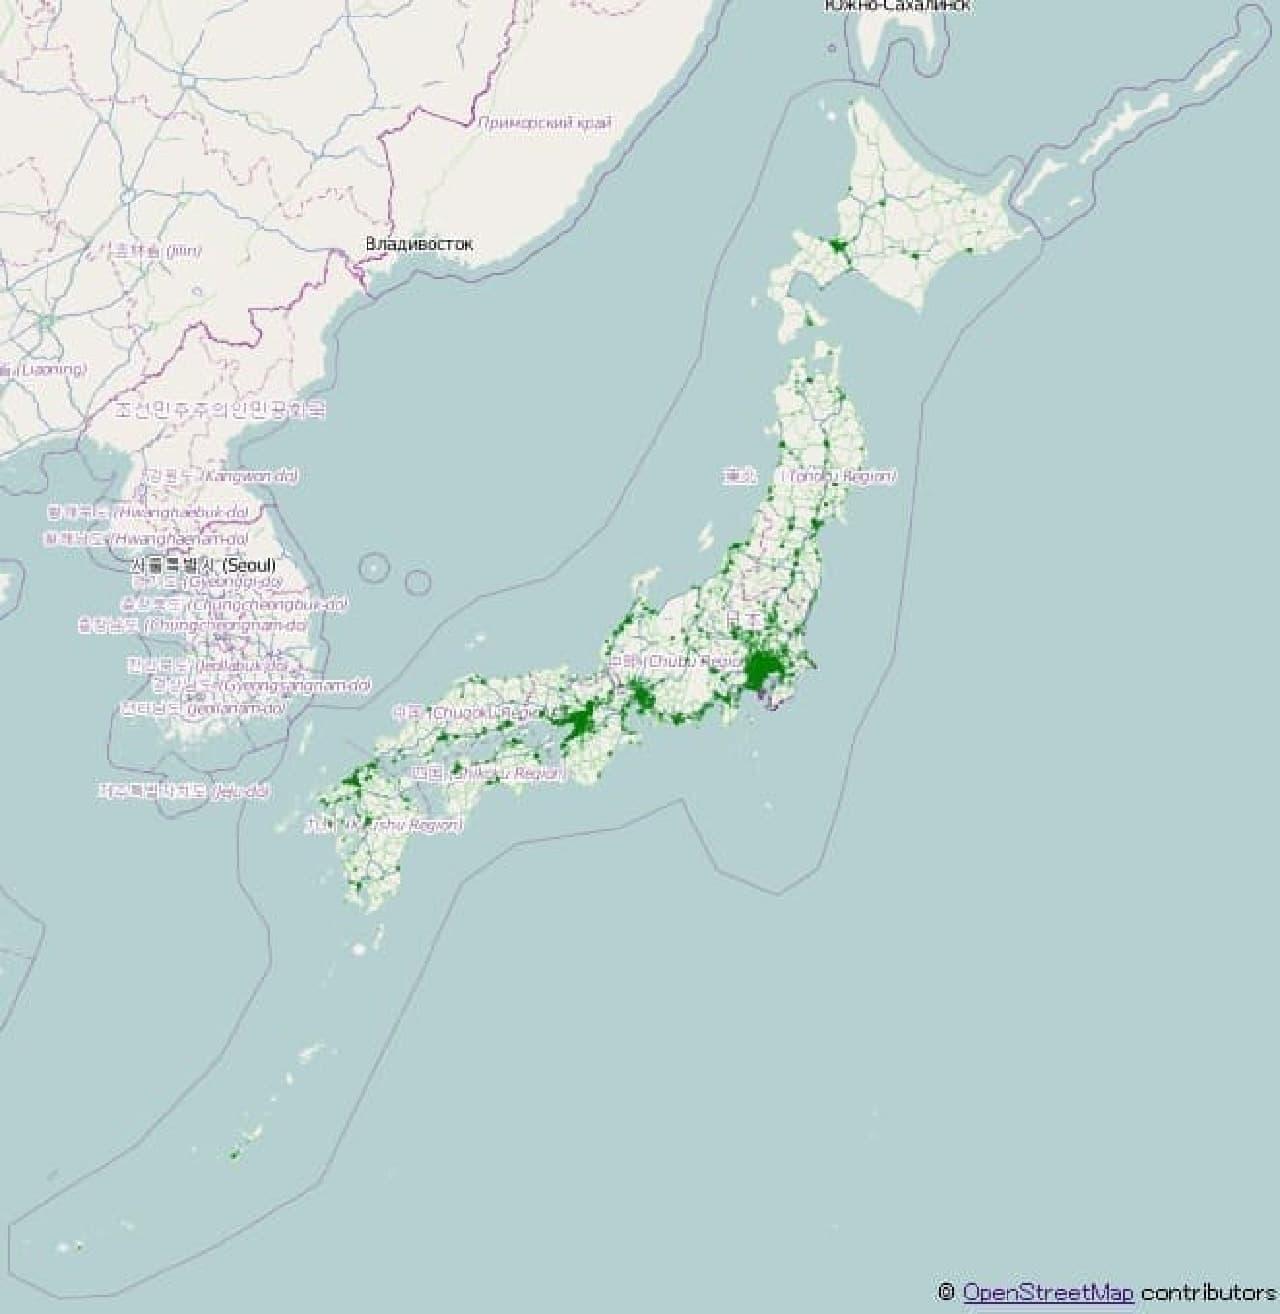 NTTデータが2013年の「バルス」ツイート発信元を分析した地図。なぜ作った